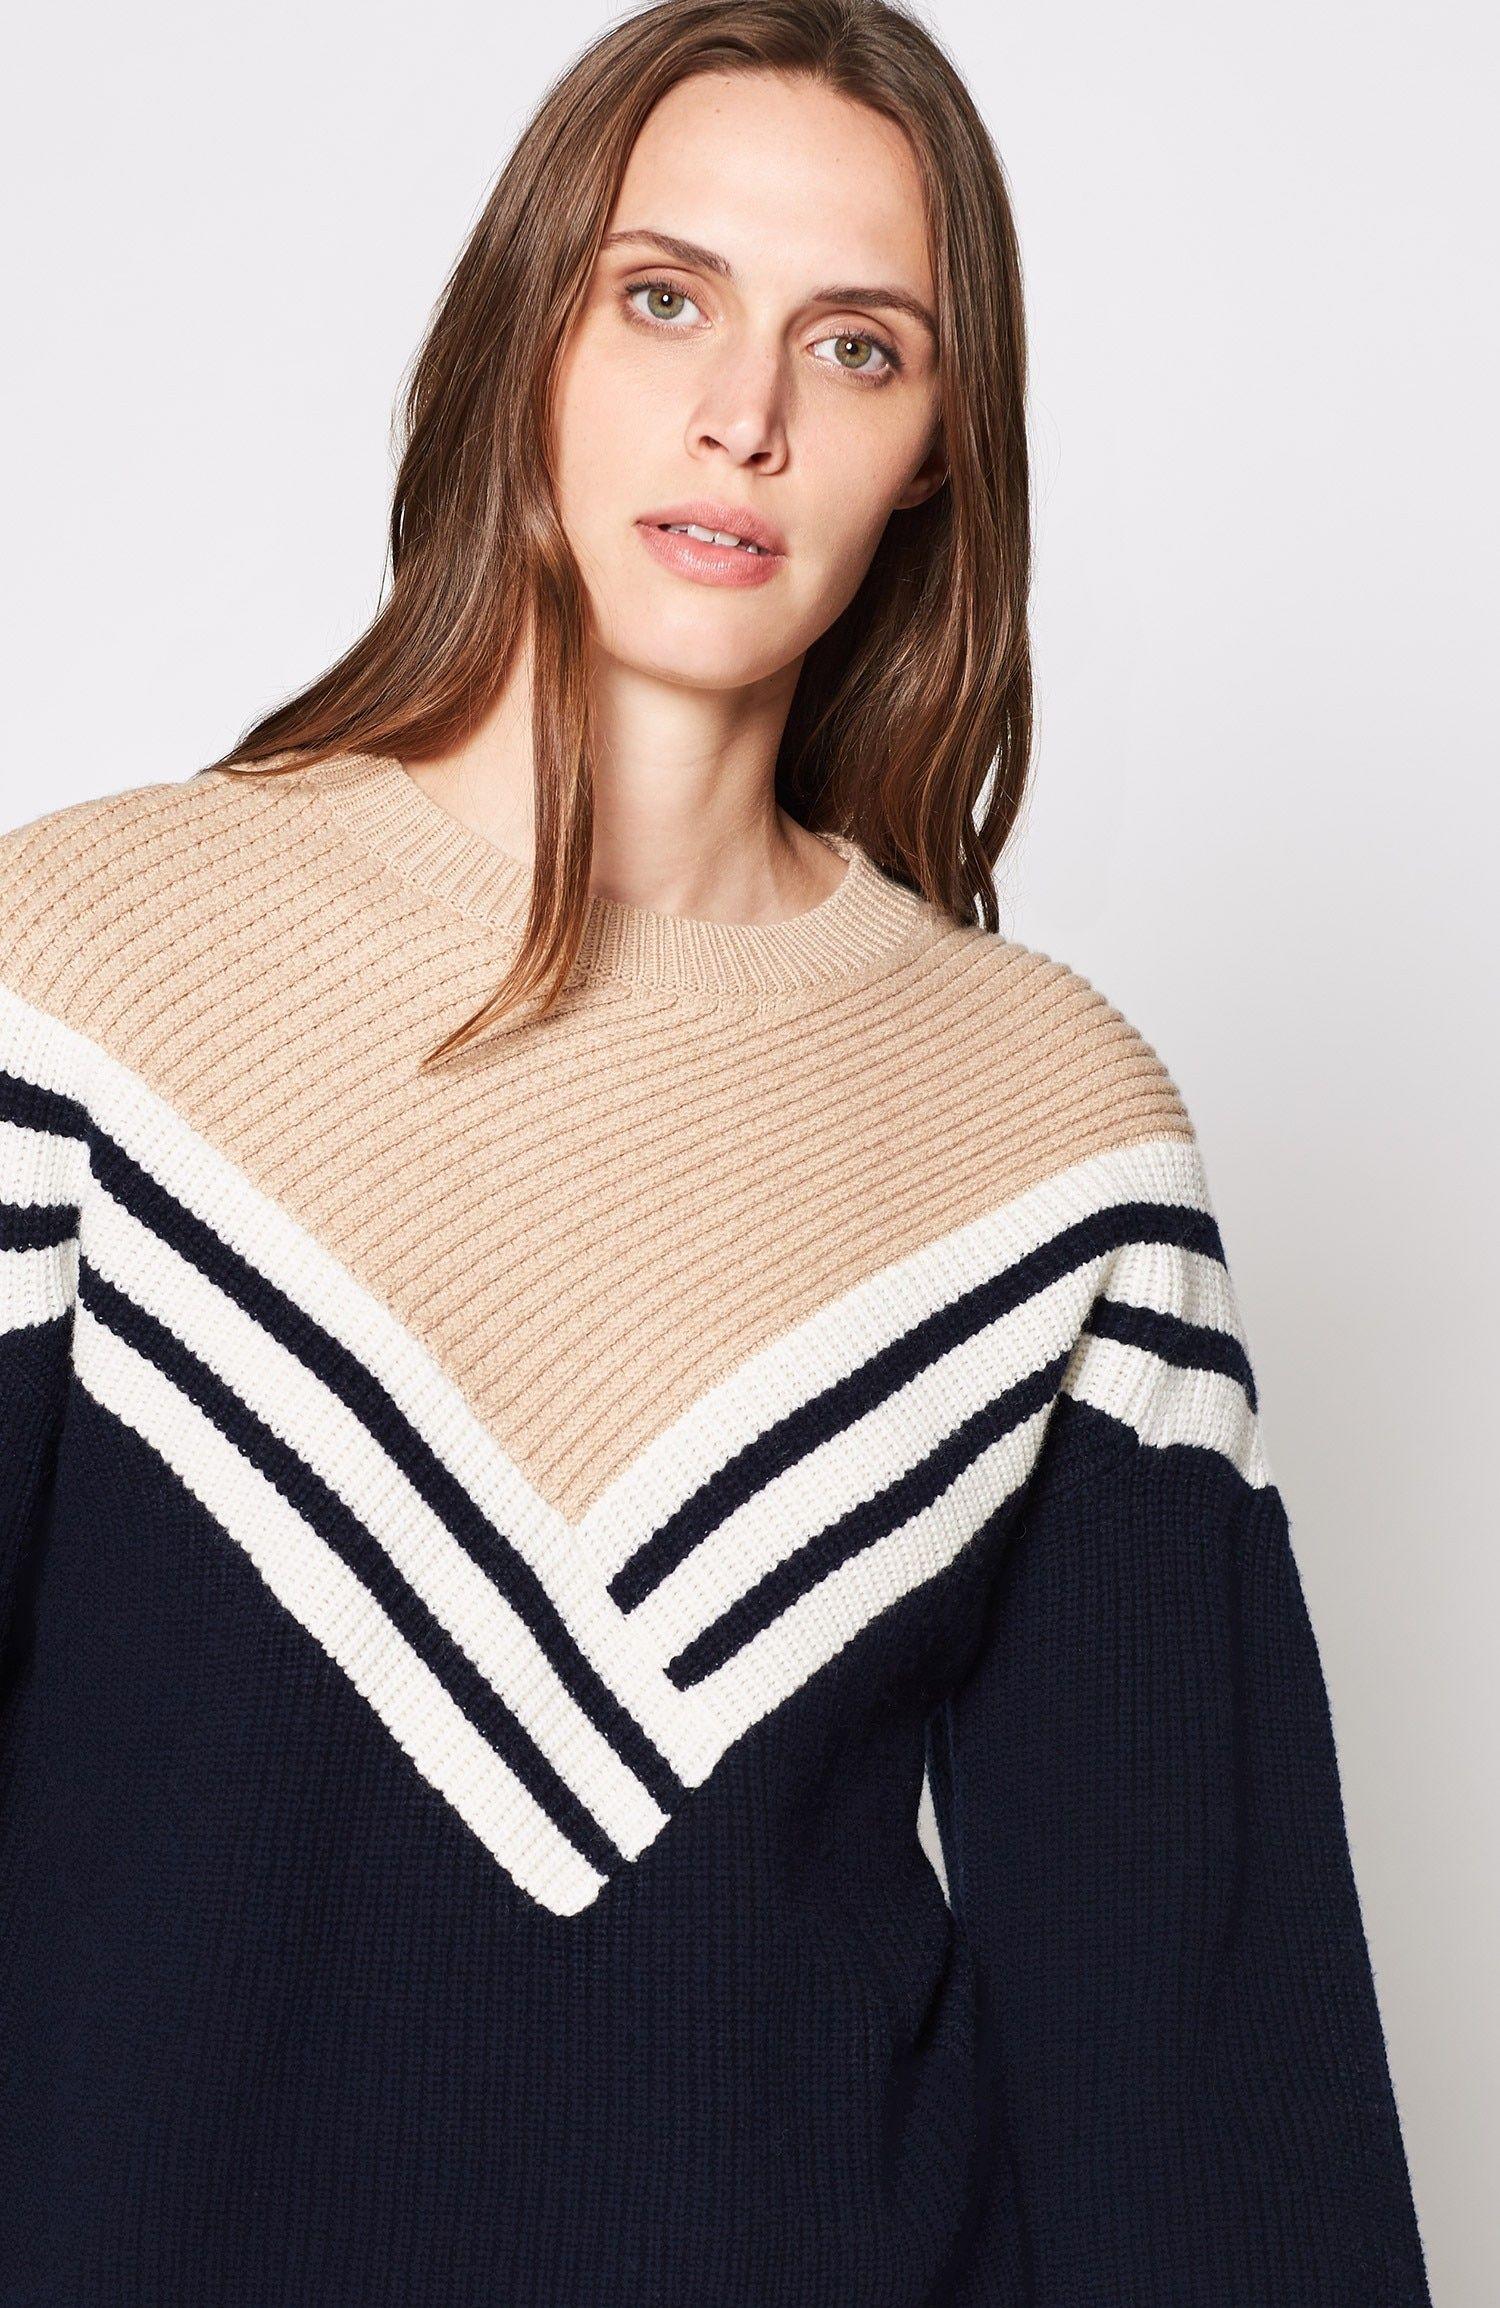 Lace Sweater Dress | Lace sweater dress, Lace sweater